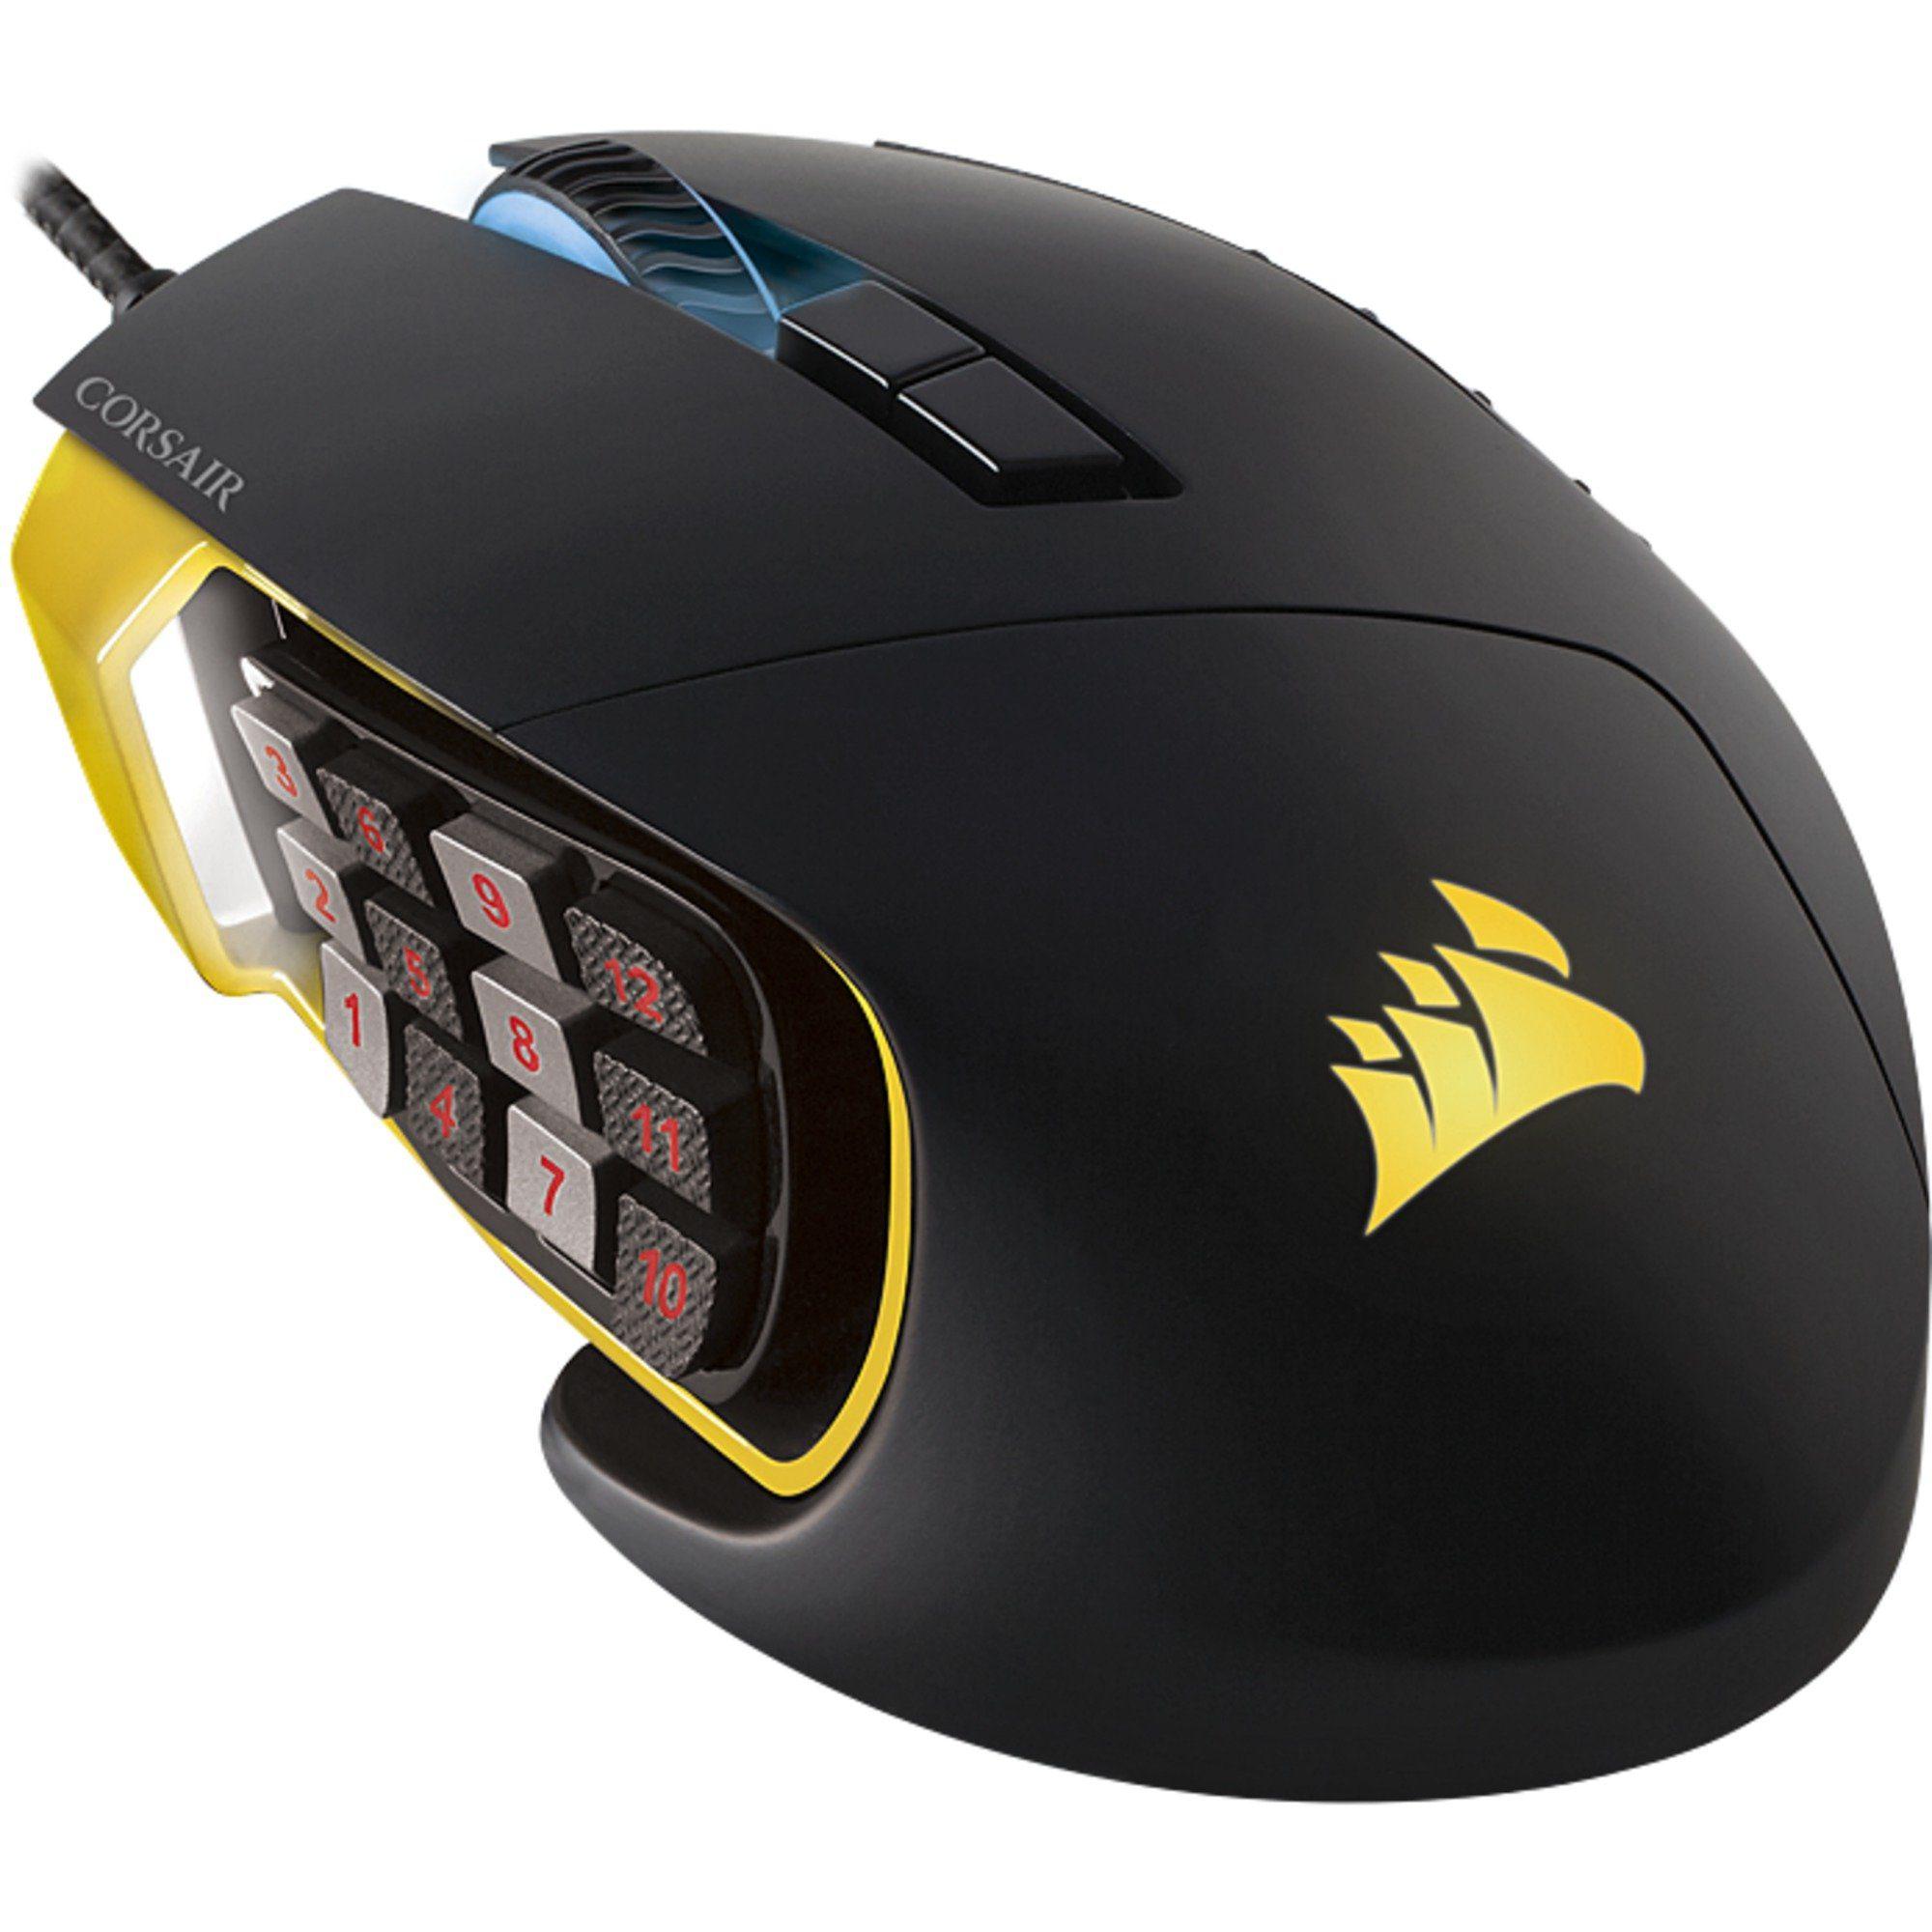 Corsair Maus »Scimitar RGB Gaming«